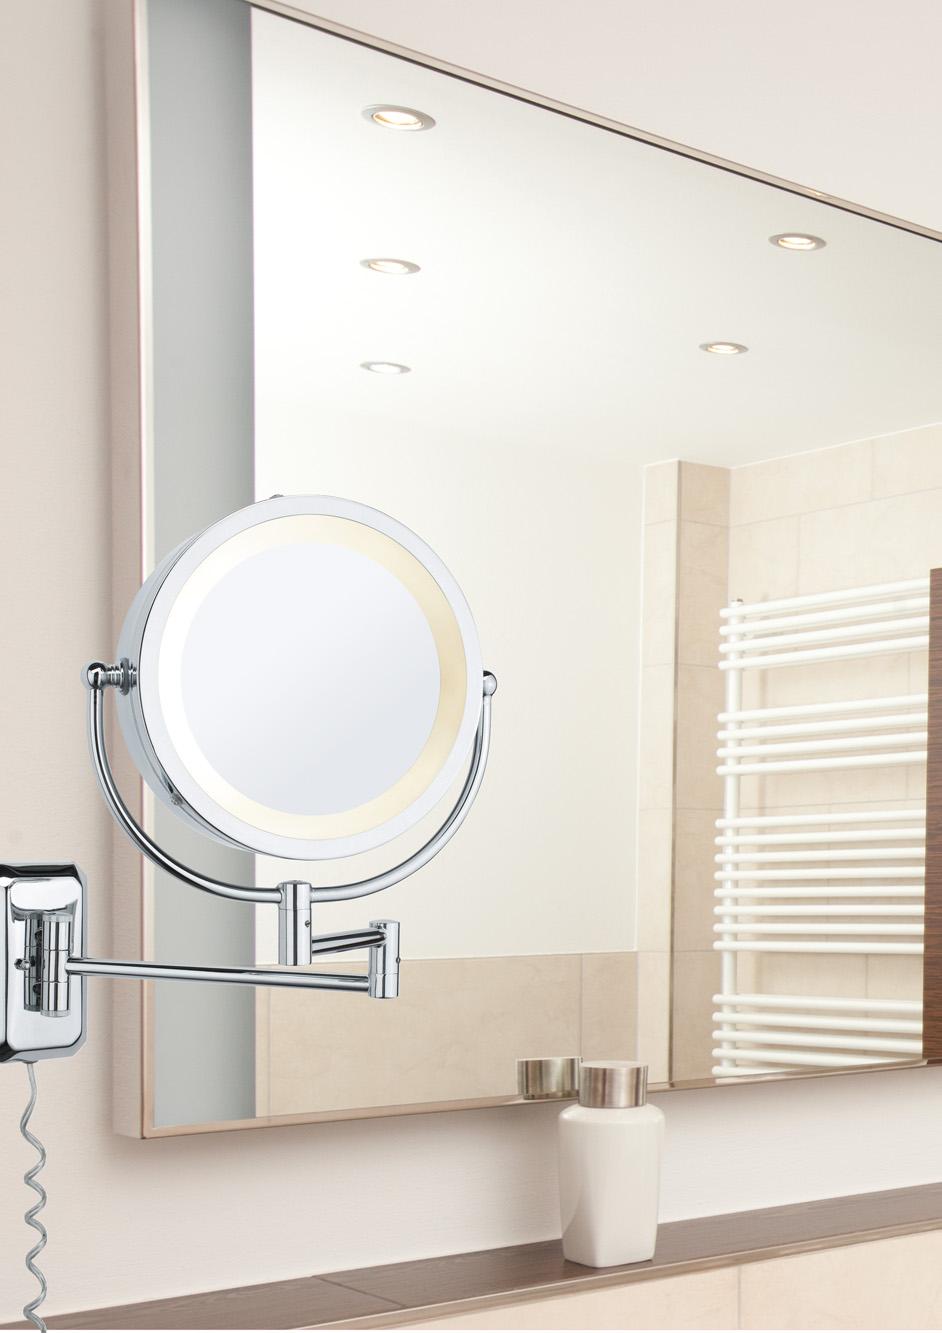 applique salle de bain paulmann bela max 40w 230v e14 chrome miroir. Black Bedroom Furniture Sets. Home Design Ideas